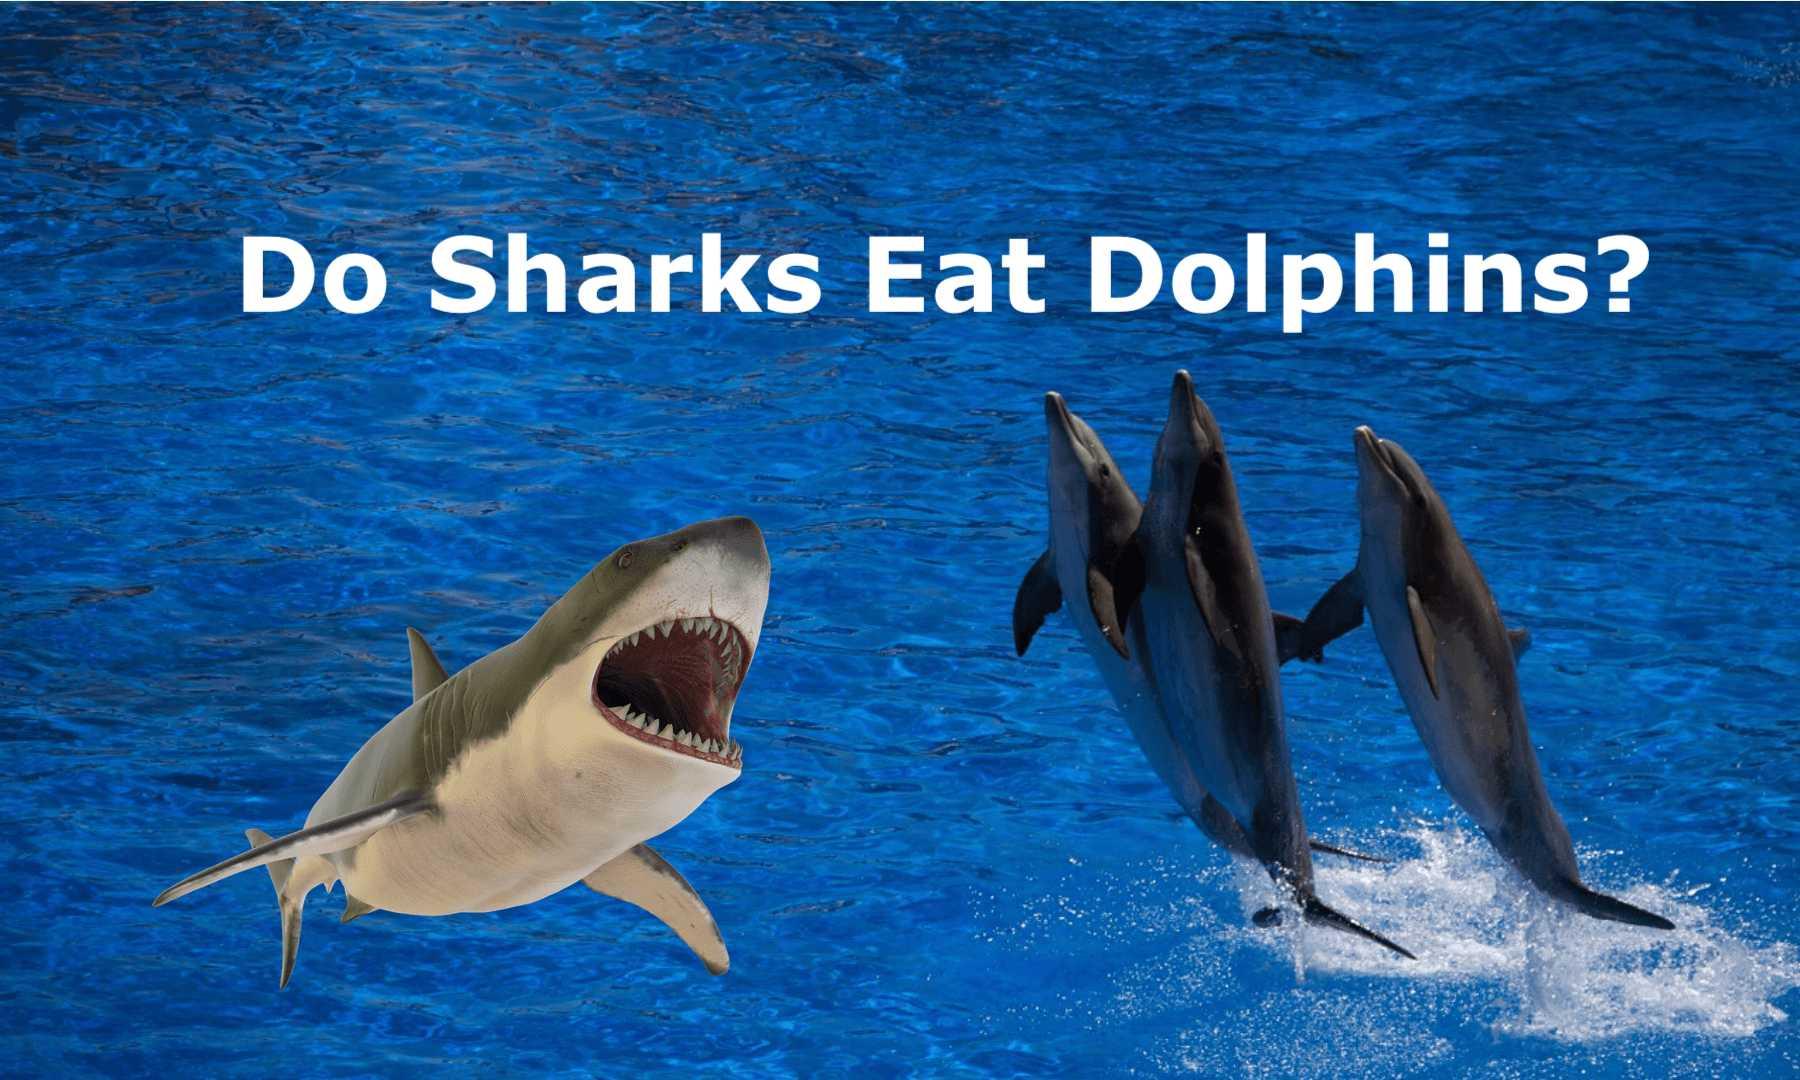 Do Sharks Eat Dolphins